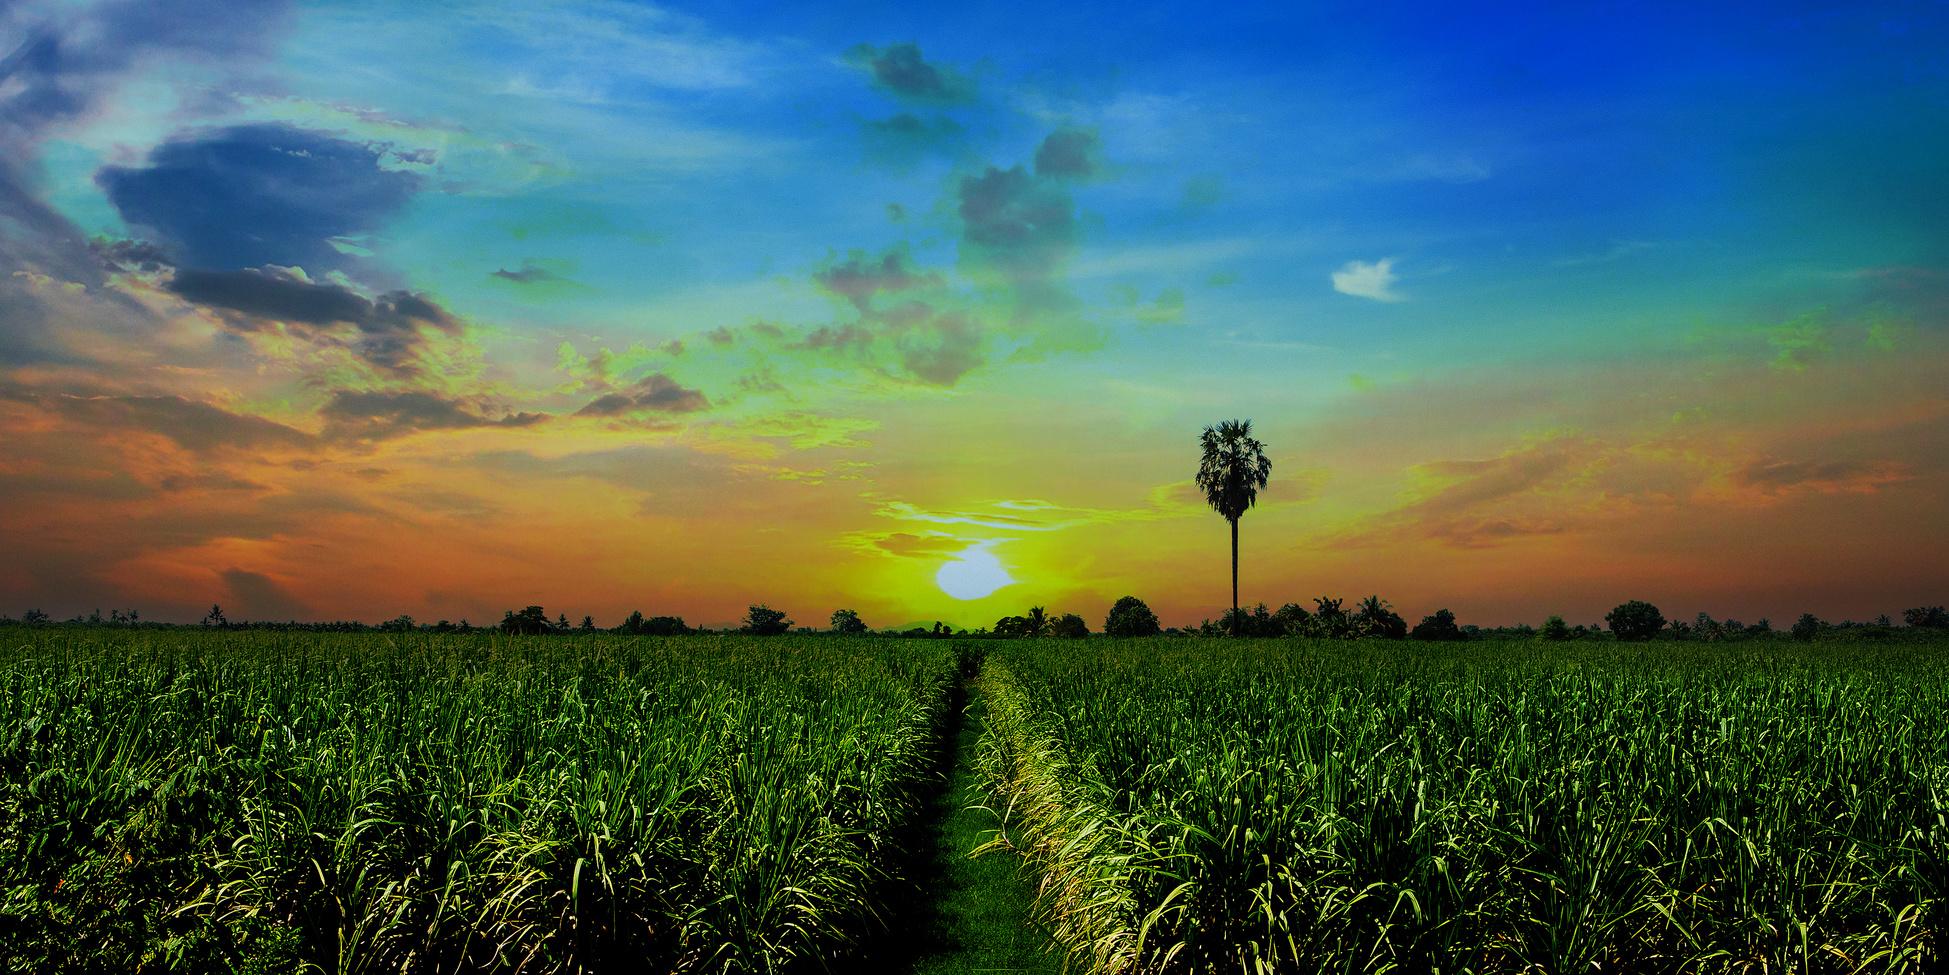 Innovation & Jobs in Belle Glade, FL - R C  HATTON FARMS